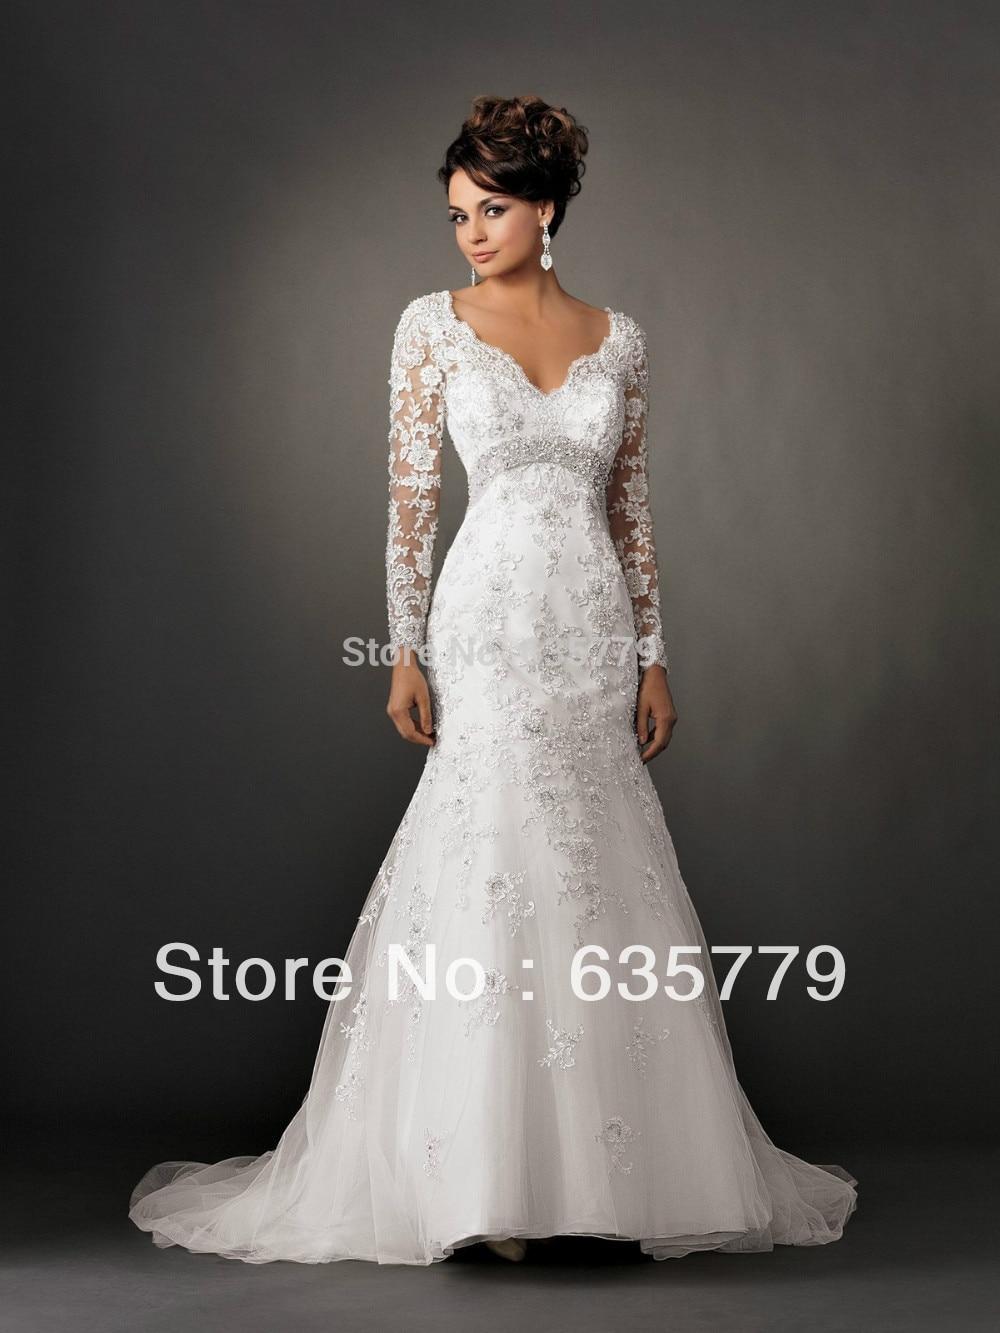 Pink Wedding Dresses Cotton Silver White Dress Cute Mermaid Floor ...